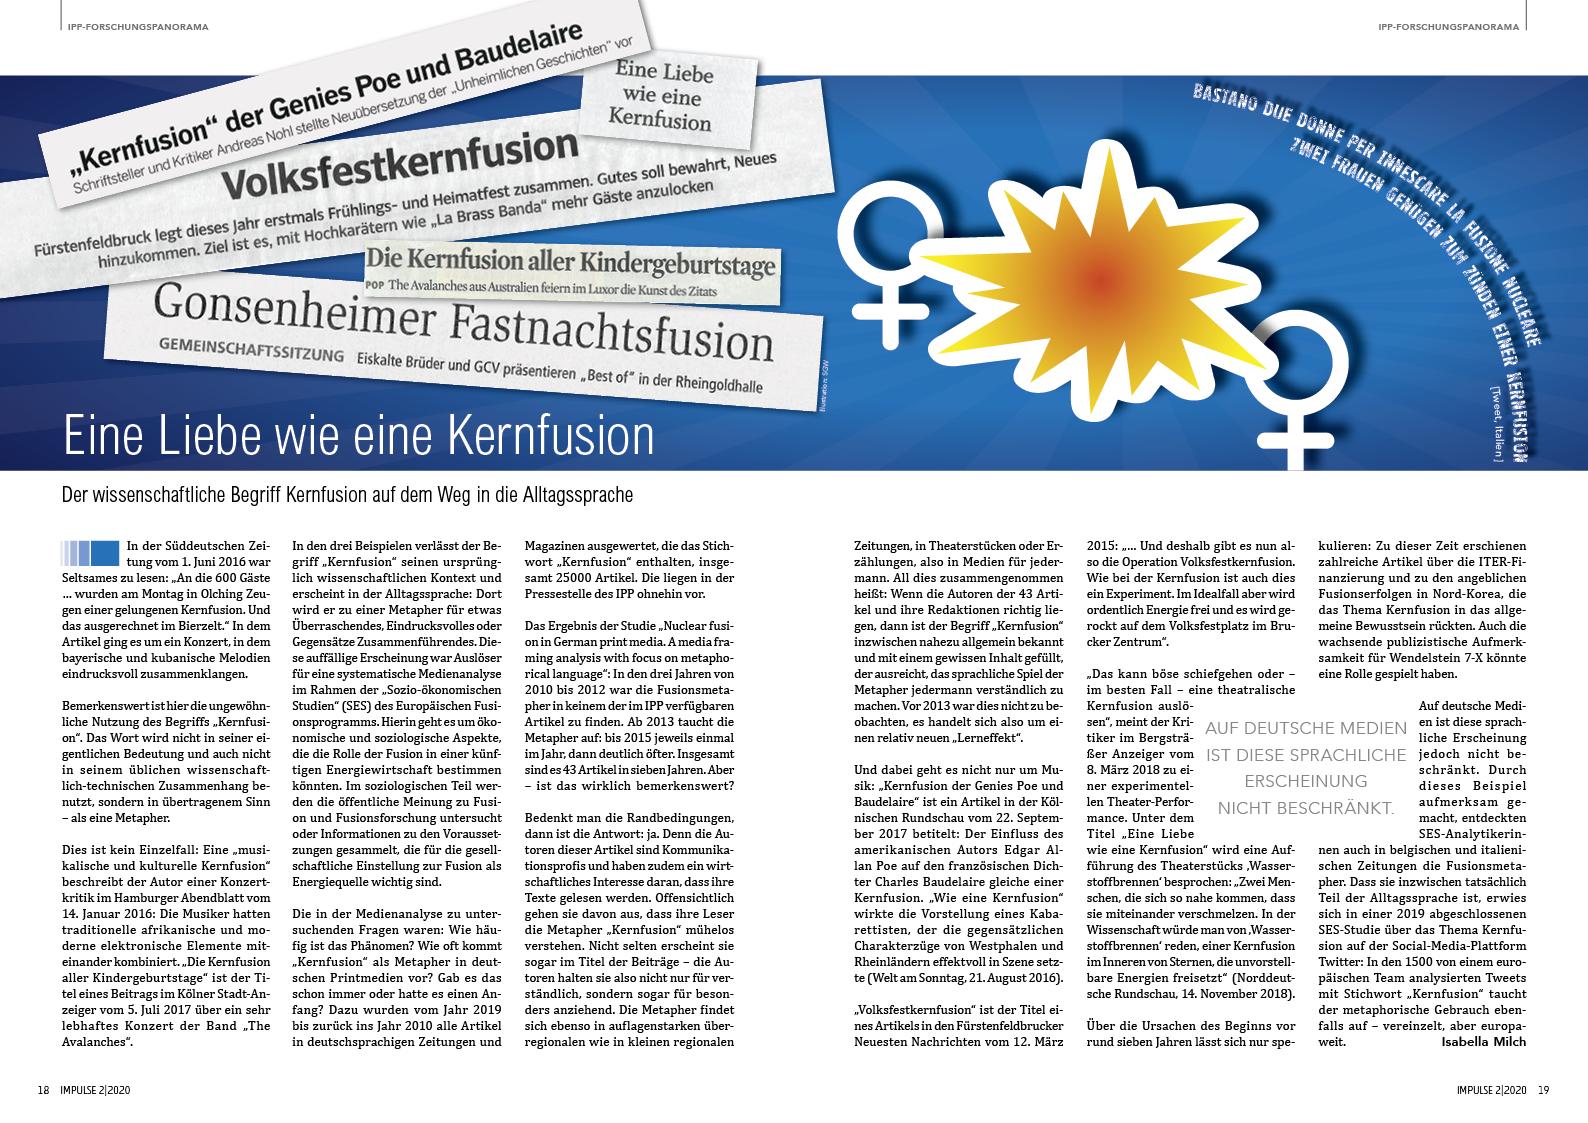 IPP Hauszeitschrift IMPULSE